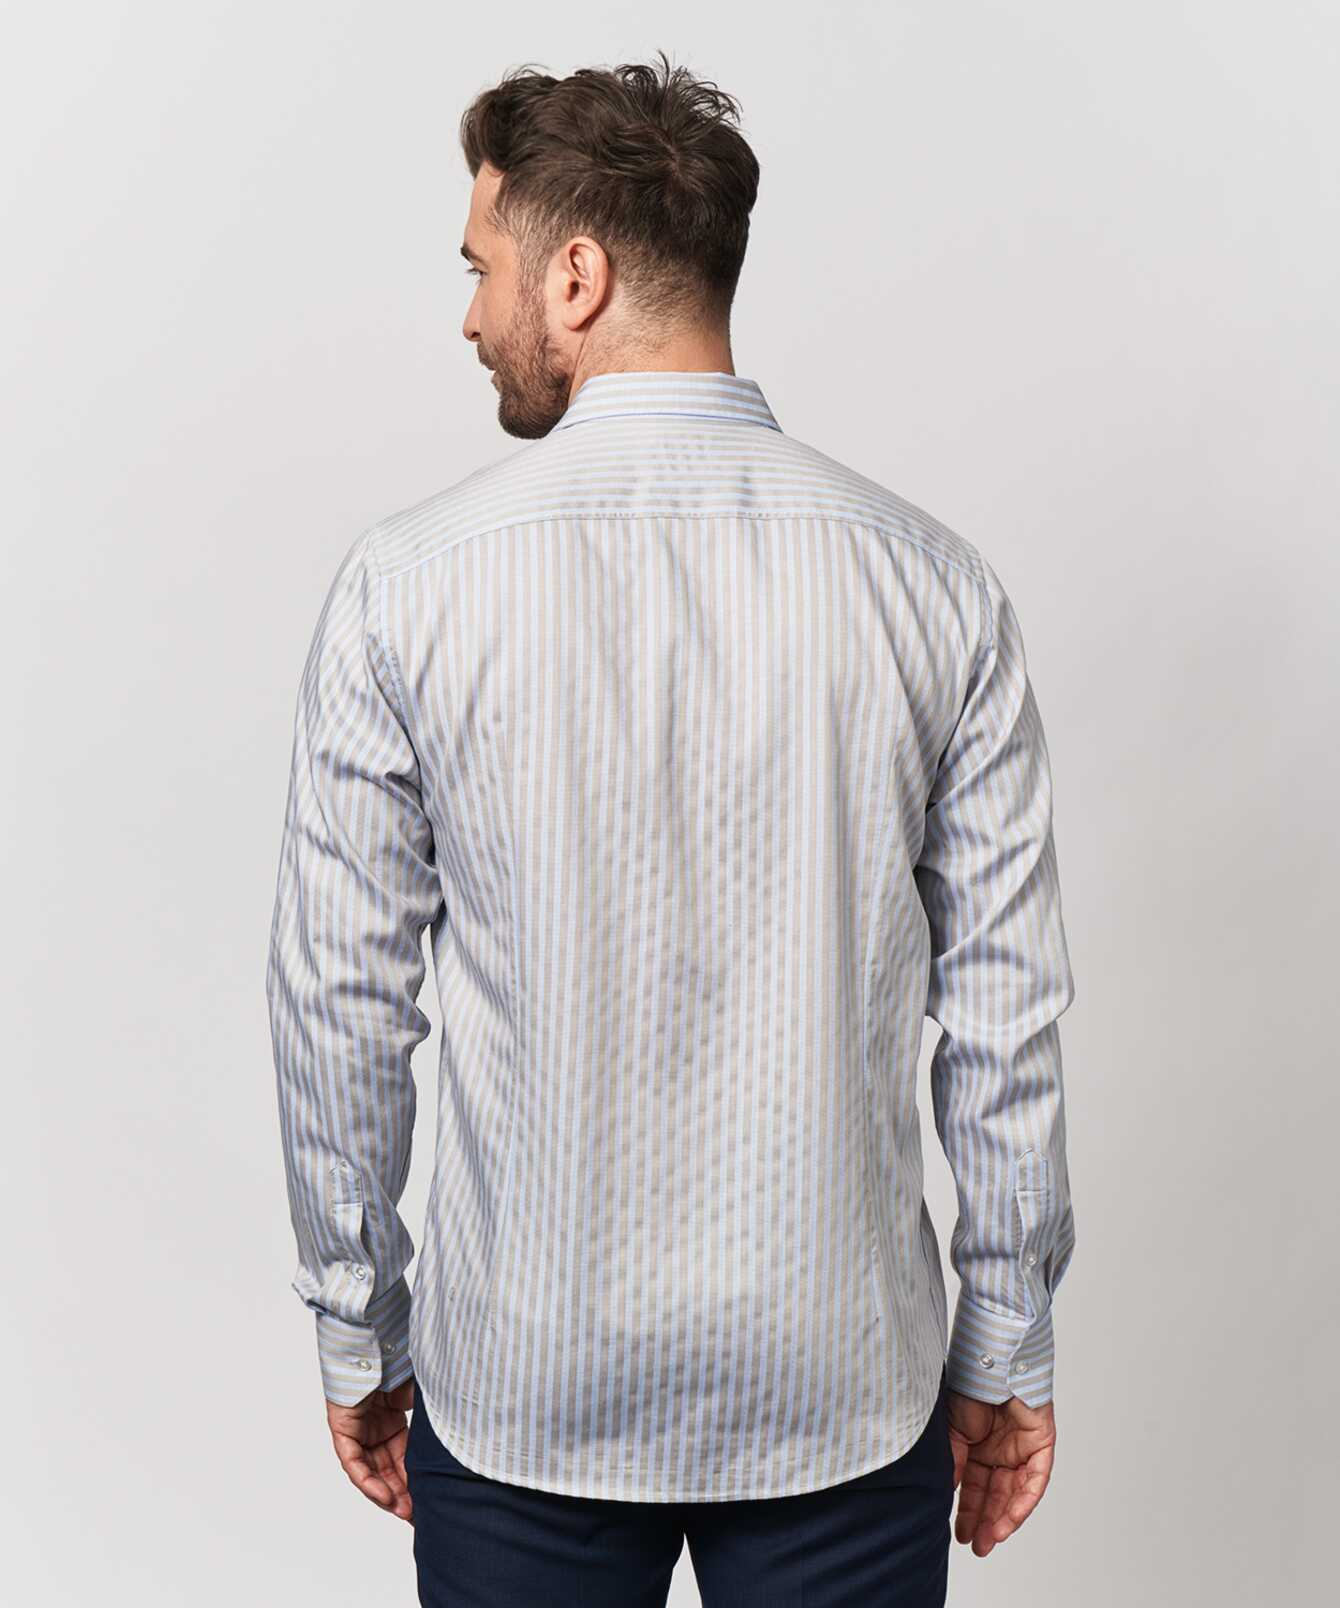 Shirt Bandon Stripe Beige The Shirt Factory